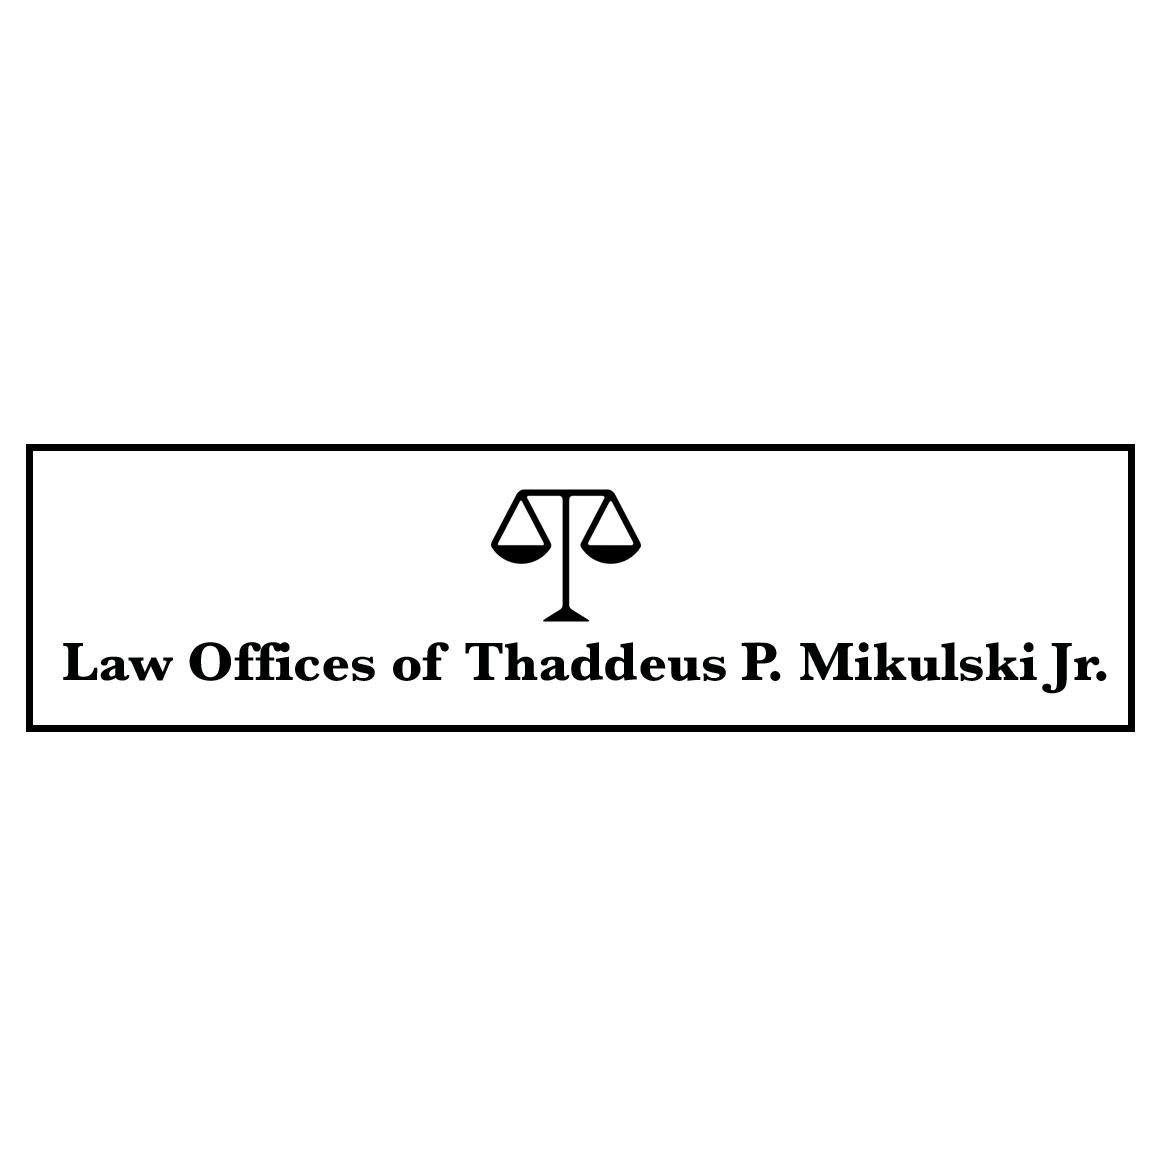 Law Offices of Thaddeus P. Mikulski Jr.